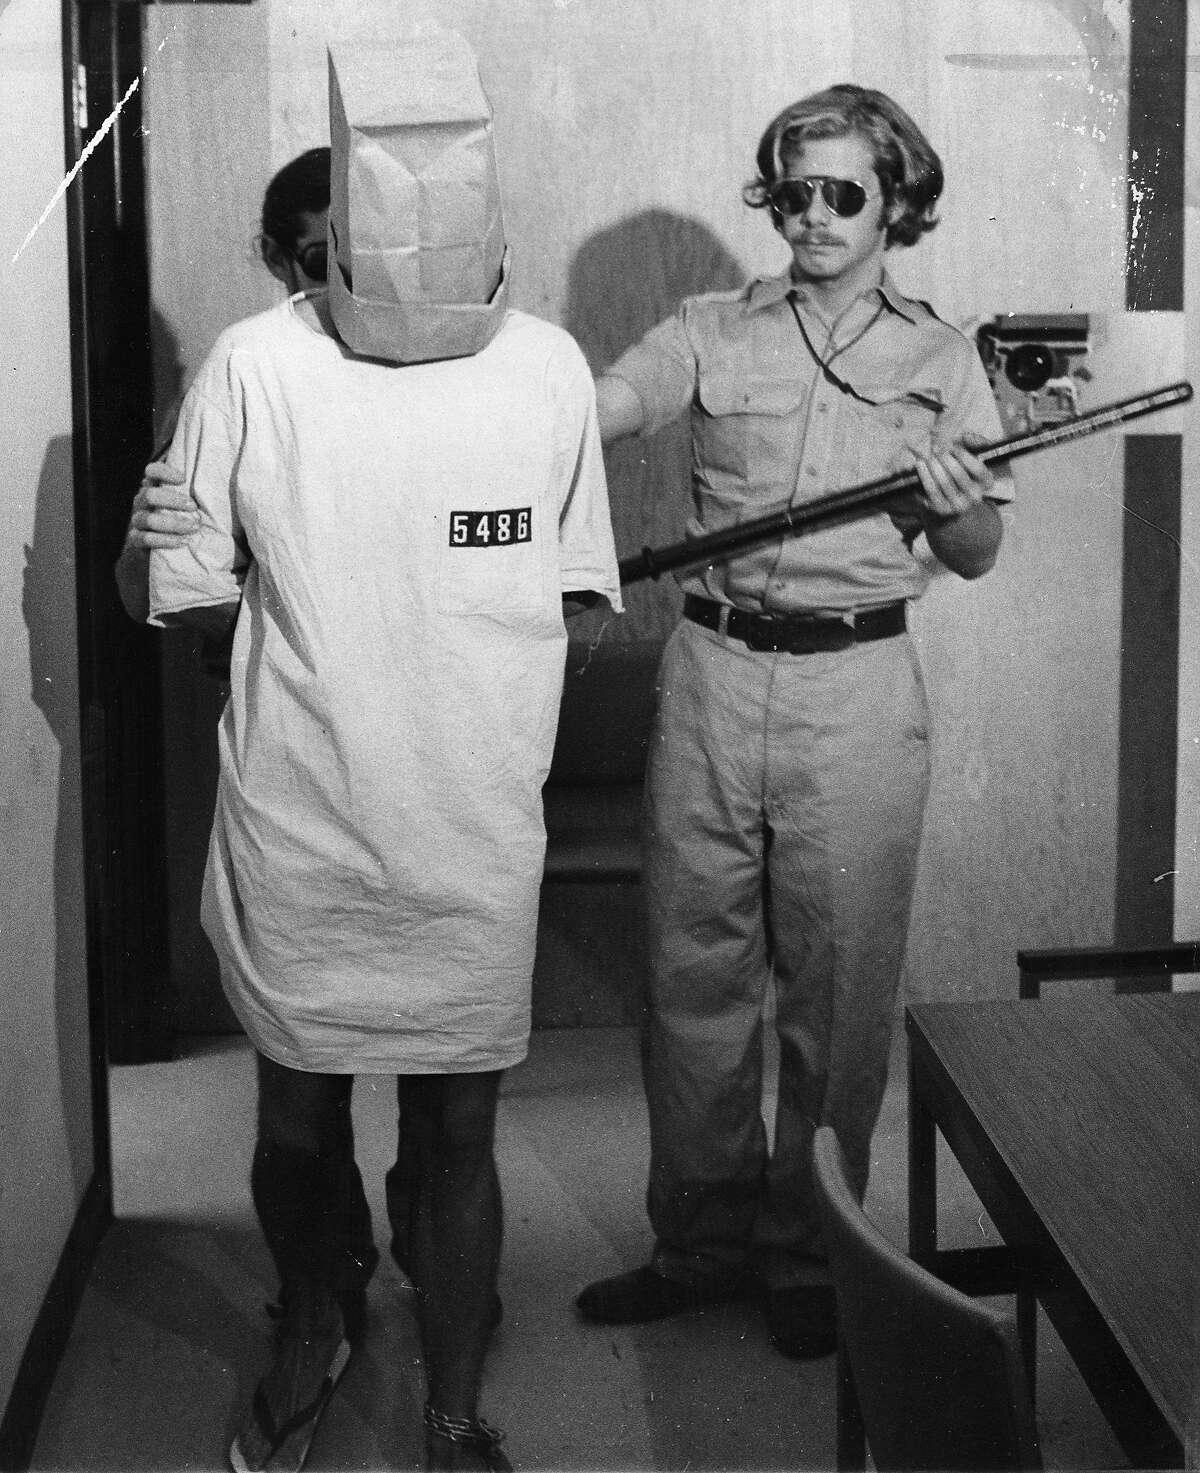 Prisoner with guard John Loftus, involved in the Stanford Prison Experiment.